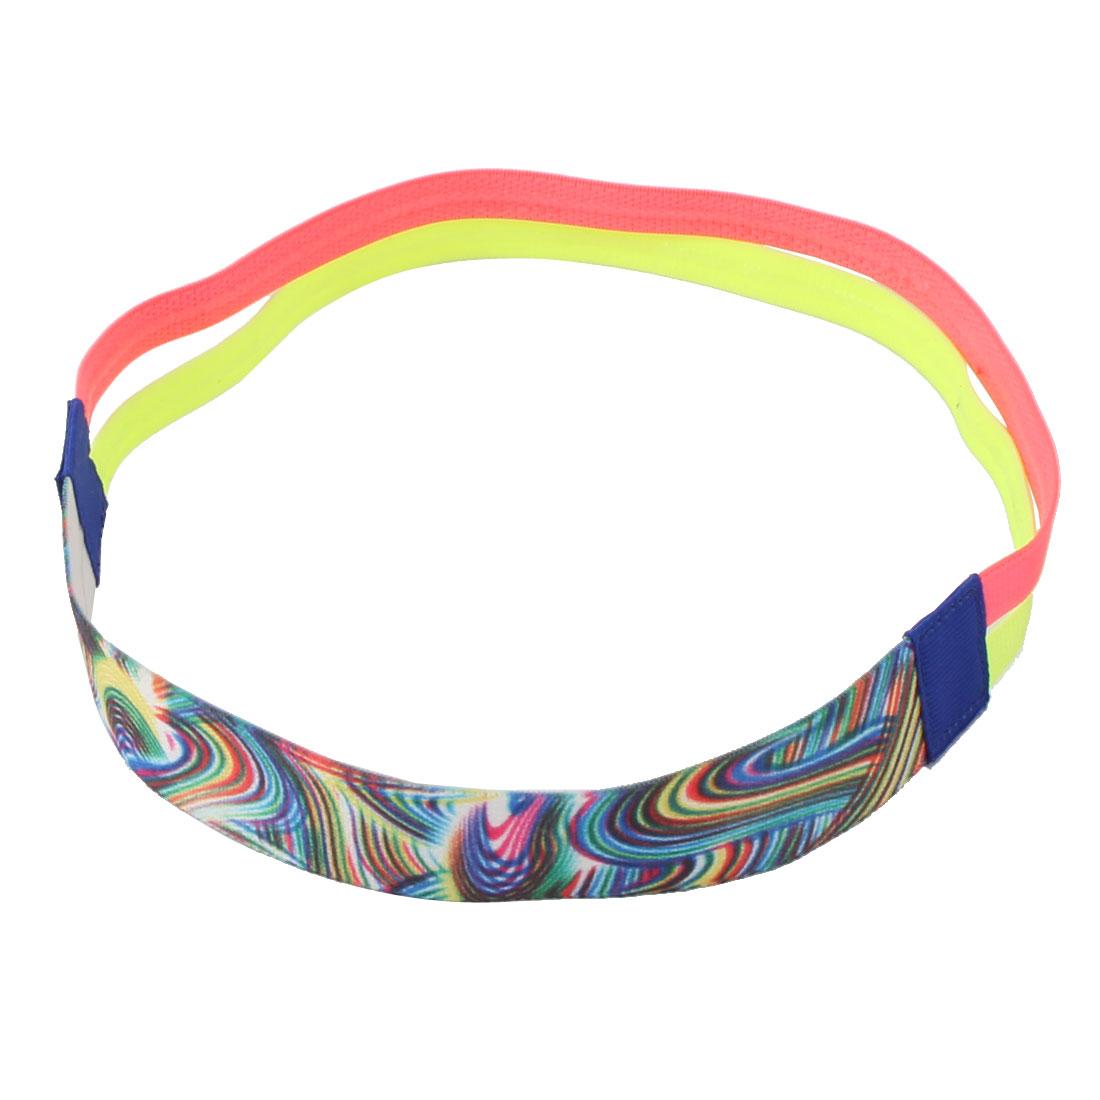 Exercise Silicone Double Line Design Non-slip Sports Headband Headwrap Pink Fluorescent Green